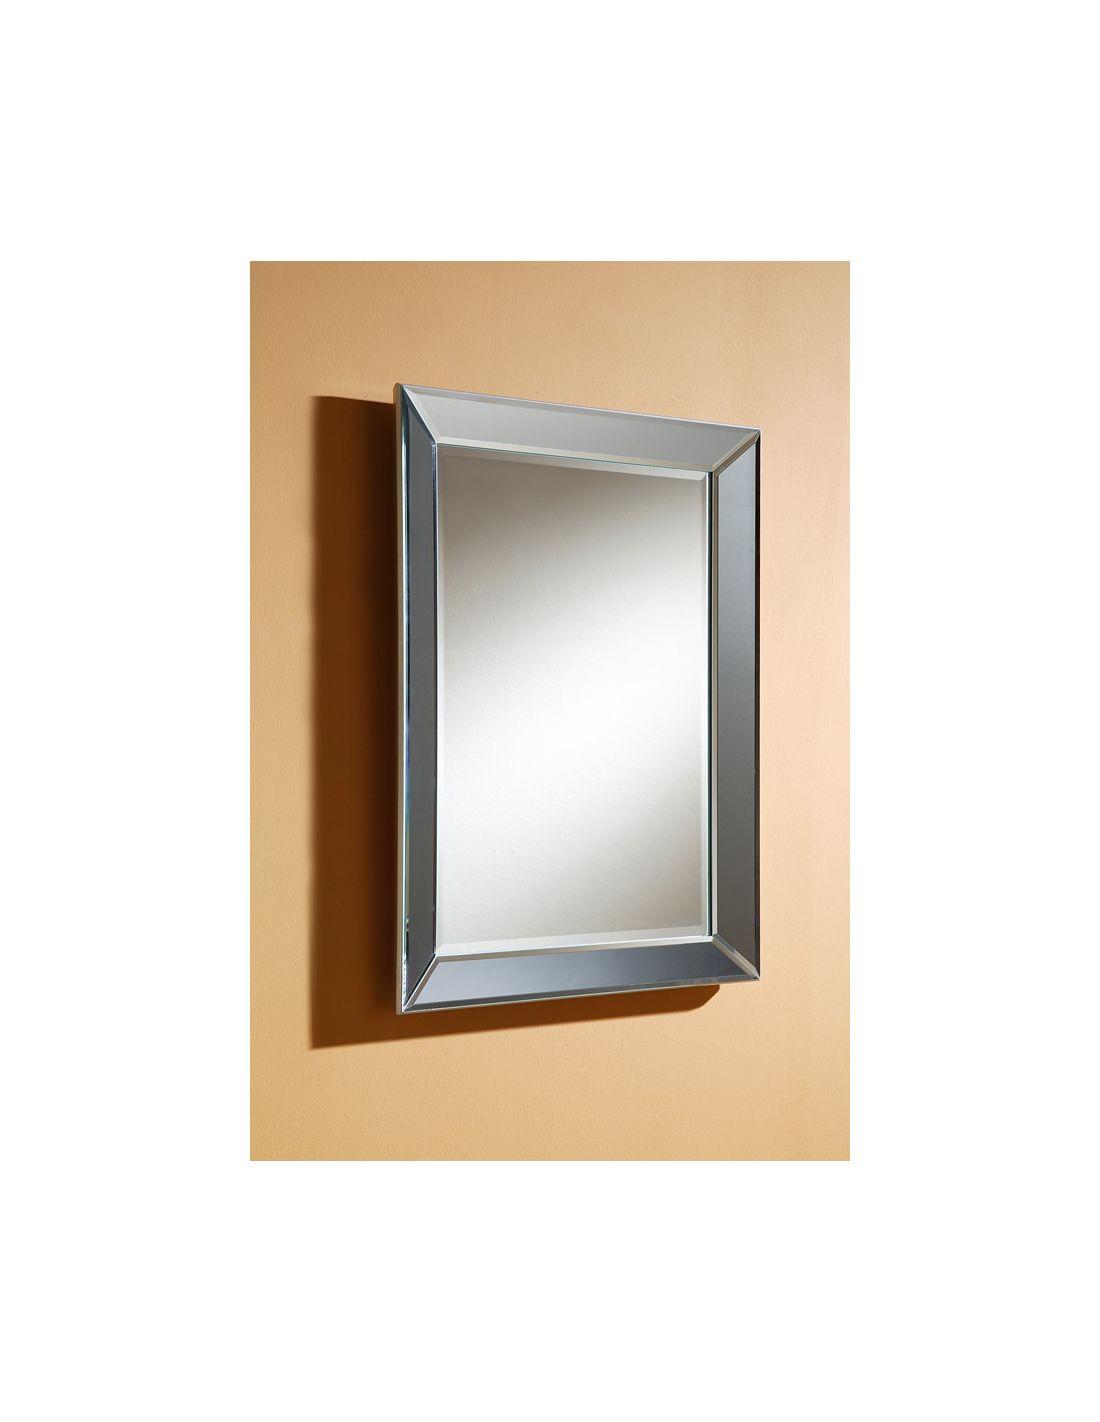 Espejo para recibidor roma de schuller gastos env o gratis for Espejos dorados baratos